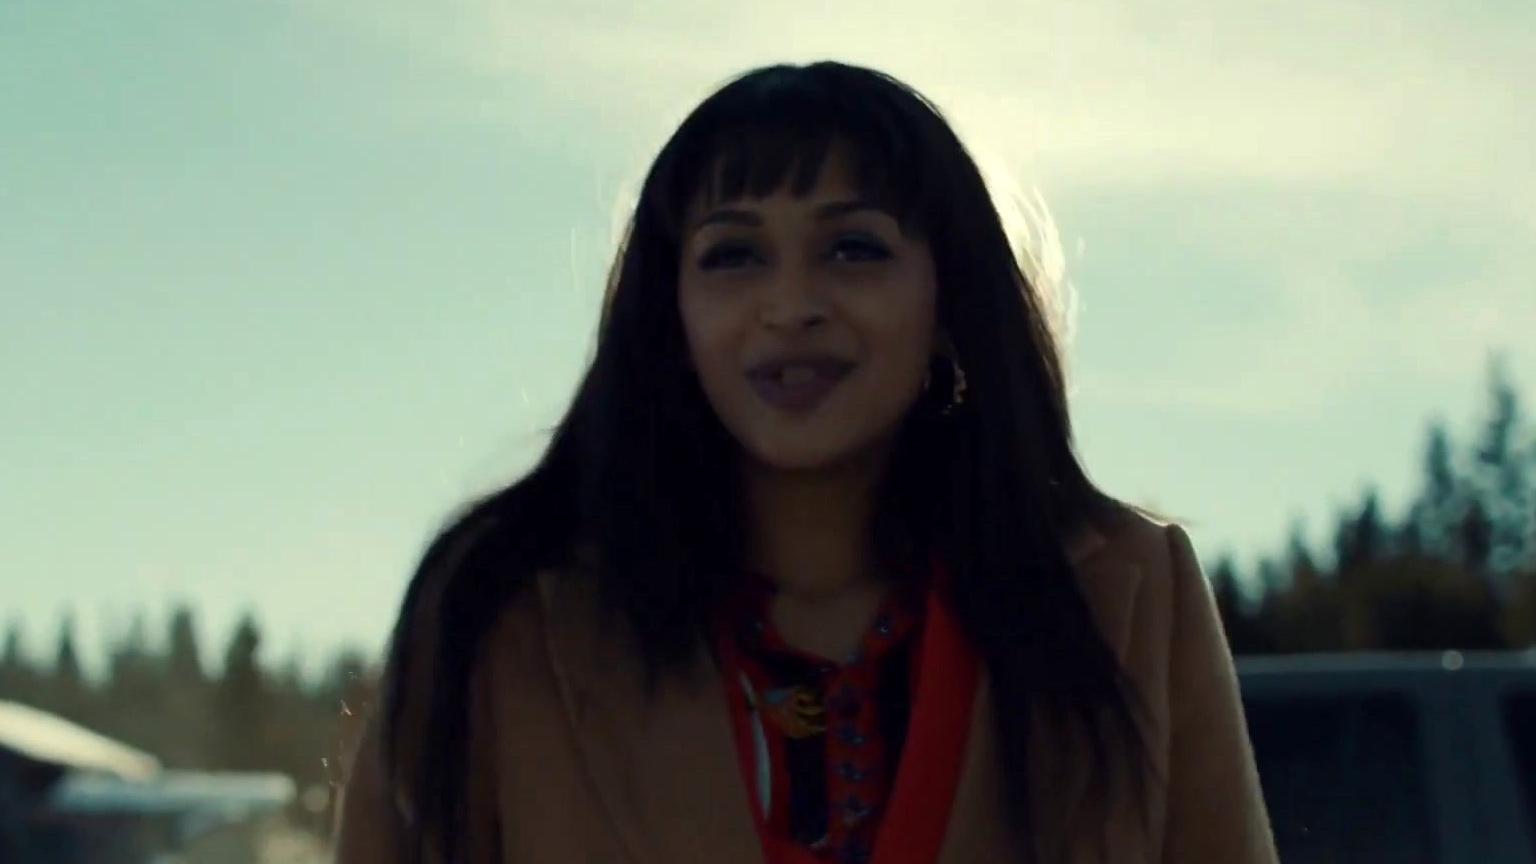 Wynonna Earp: Sheriff Nedley Survives The Demon